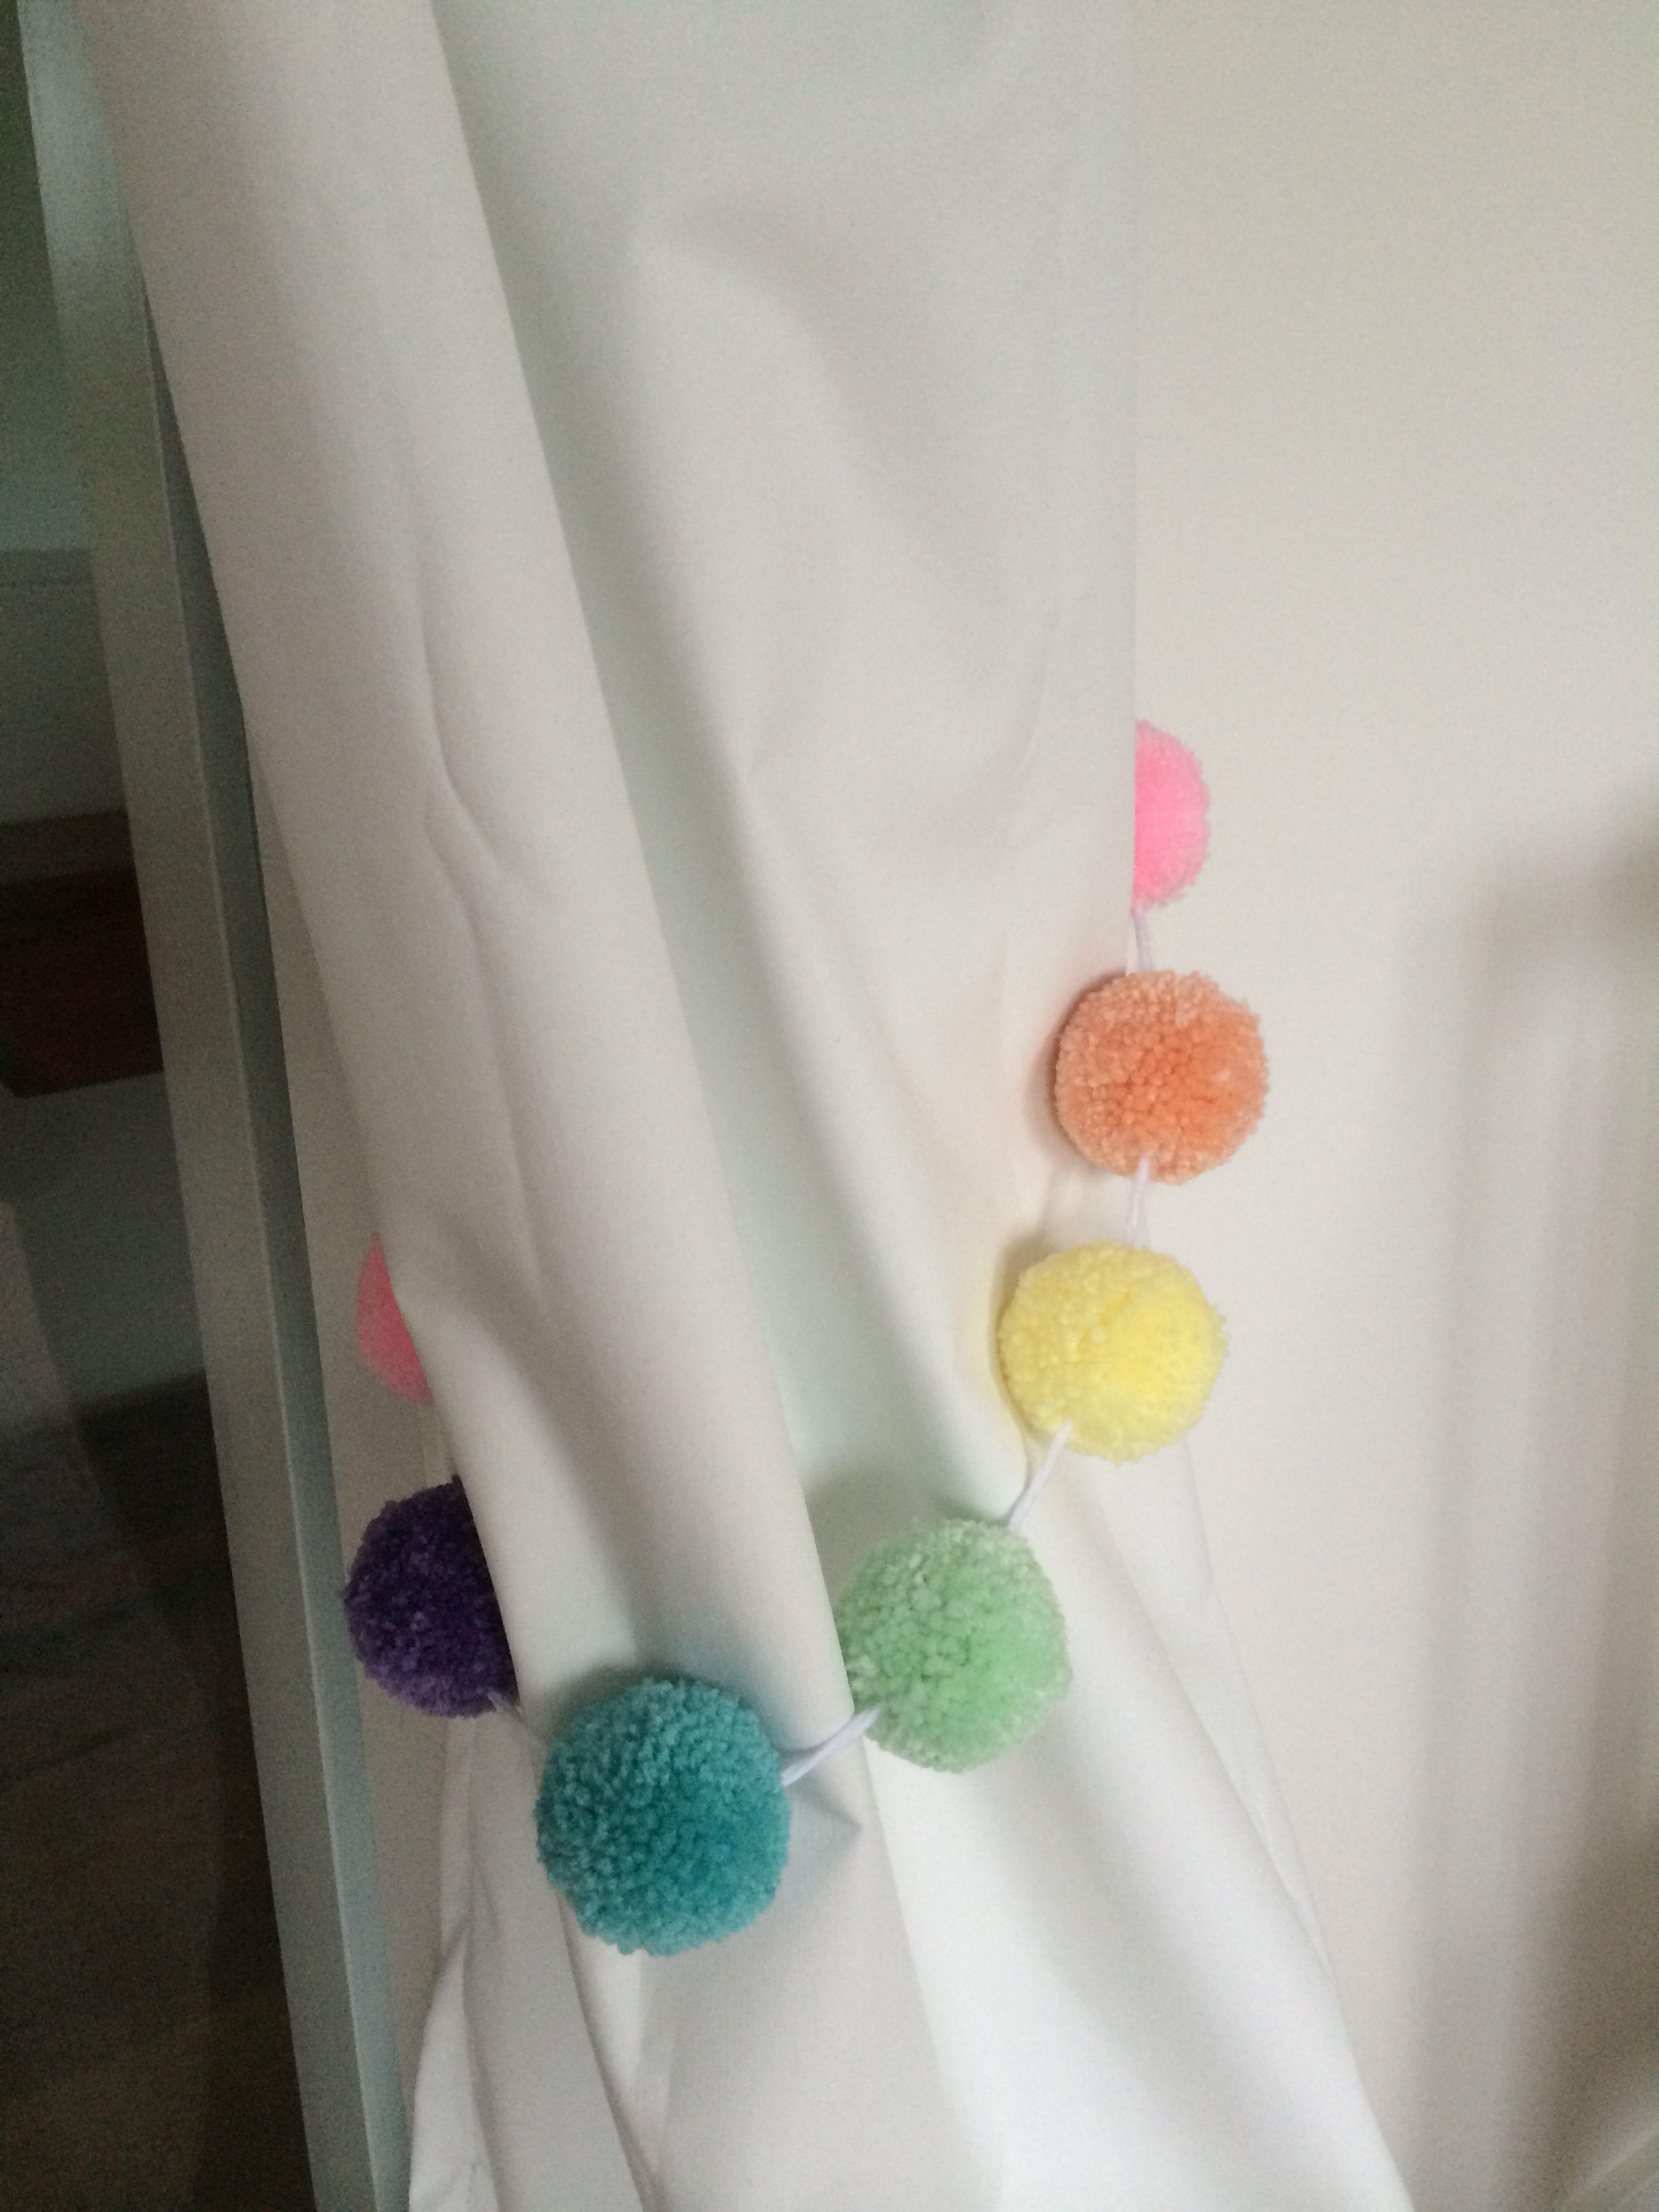 Curtain Tie Backs Made Using Pom Pom Garland By